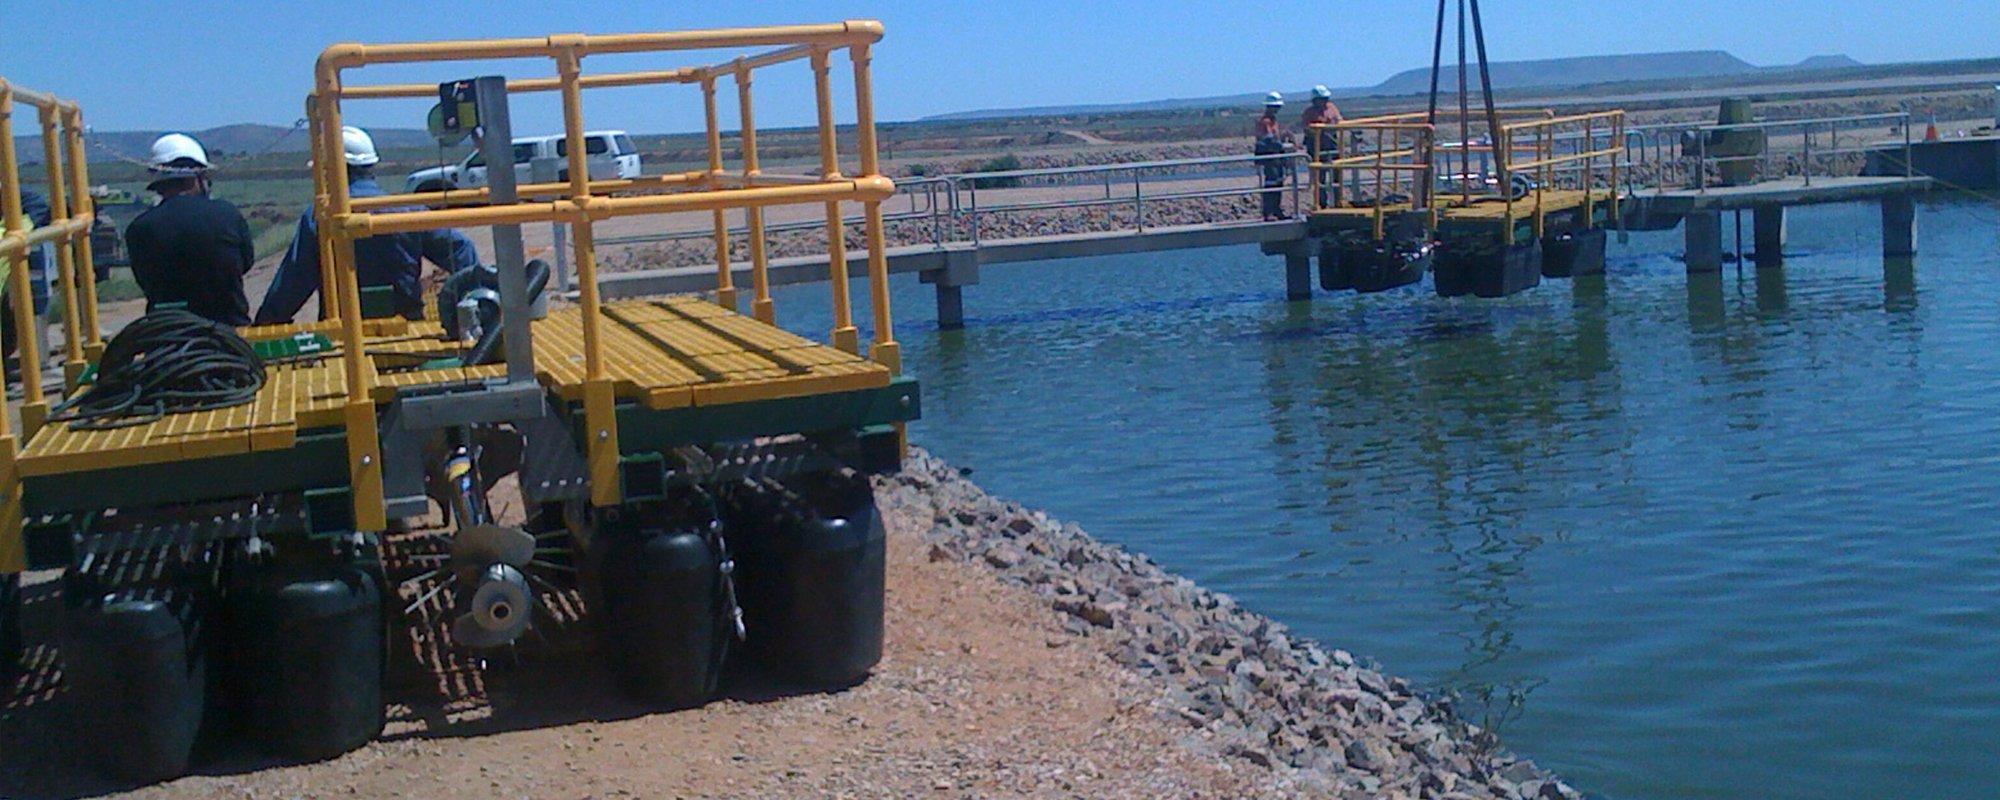 Wastewater aeration system being insstalled